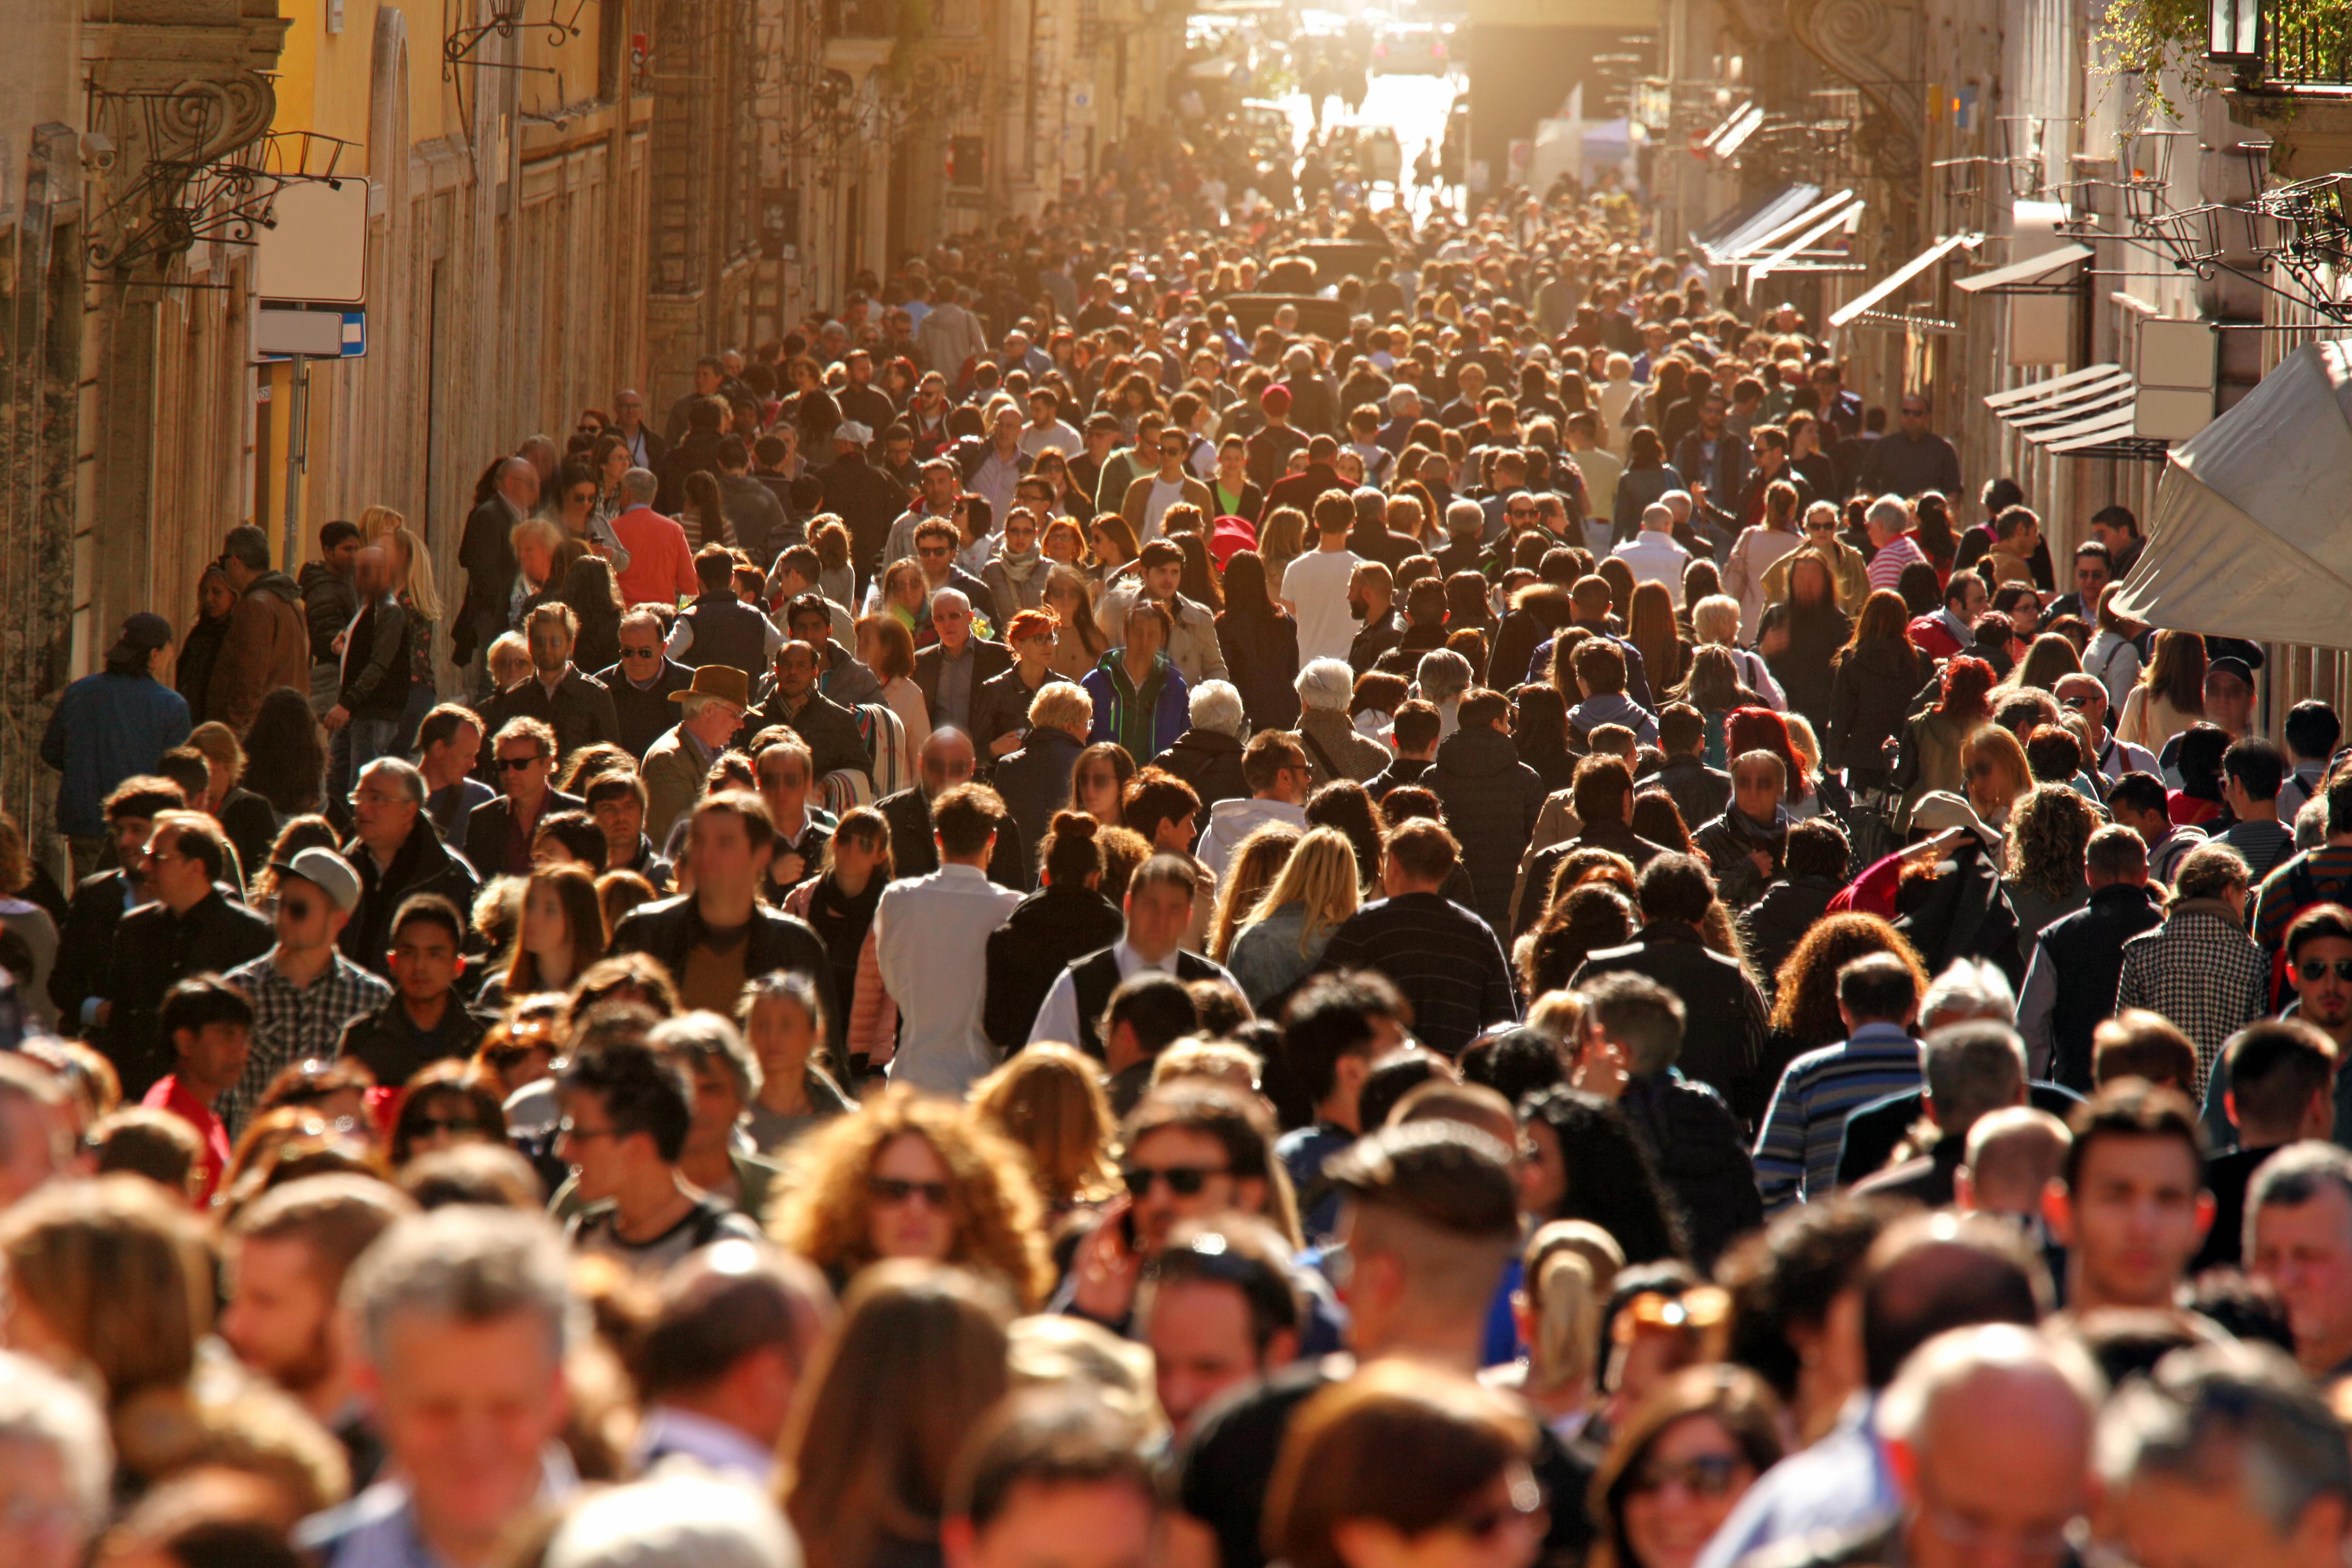 Crowd of people walking on street in downtown Rome, sunlight